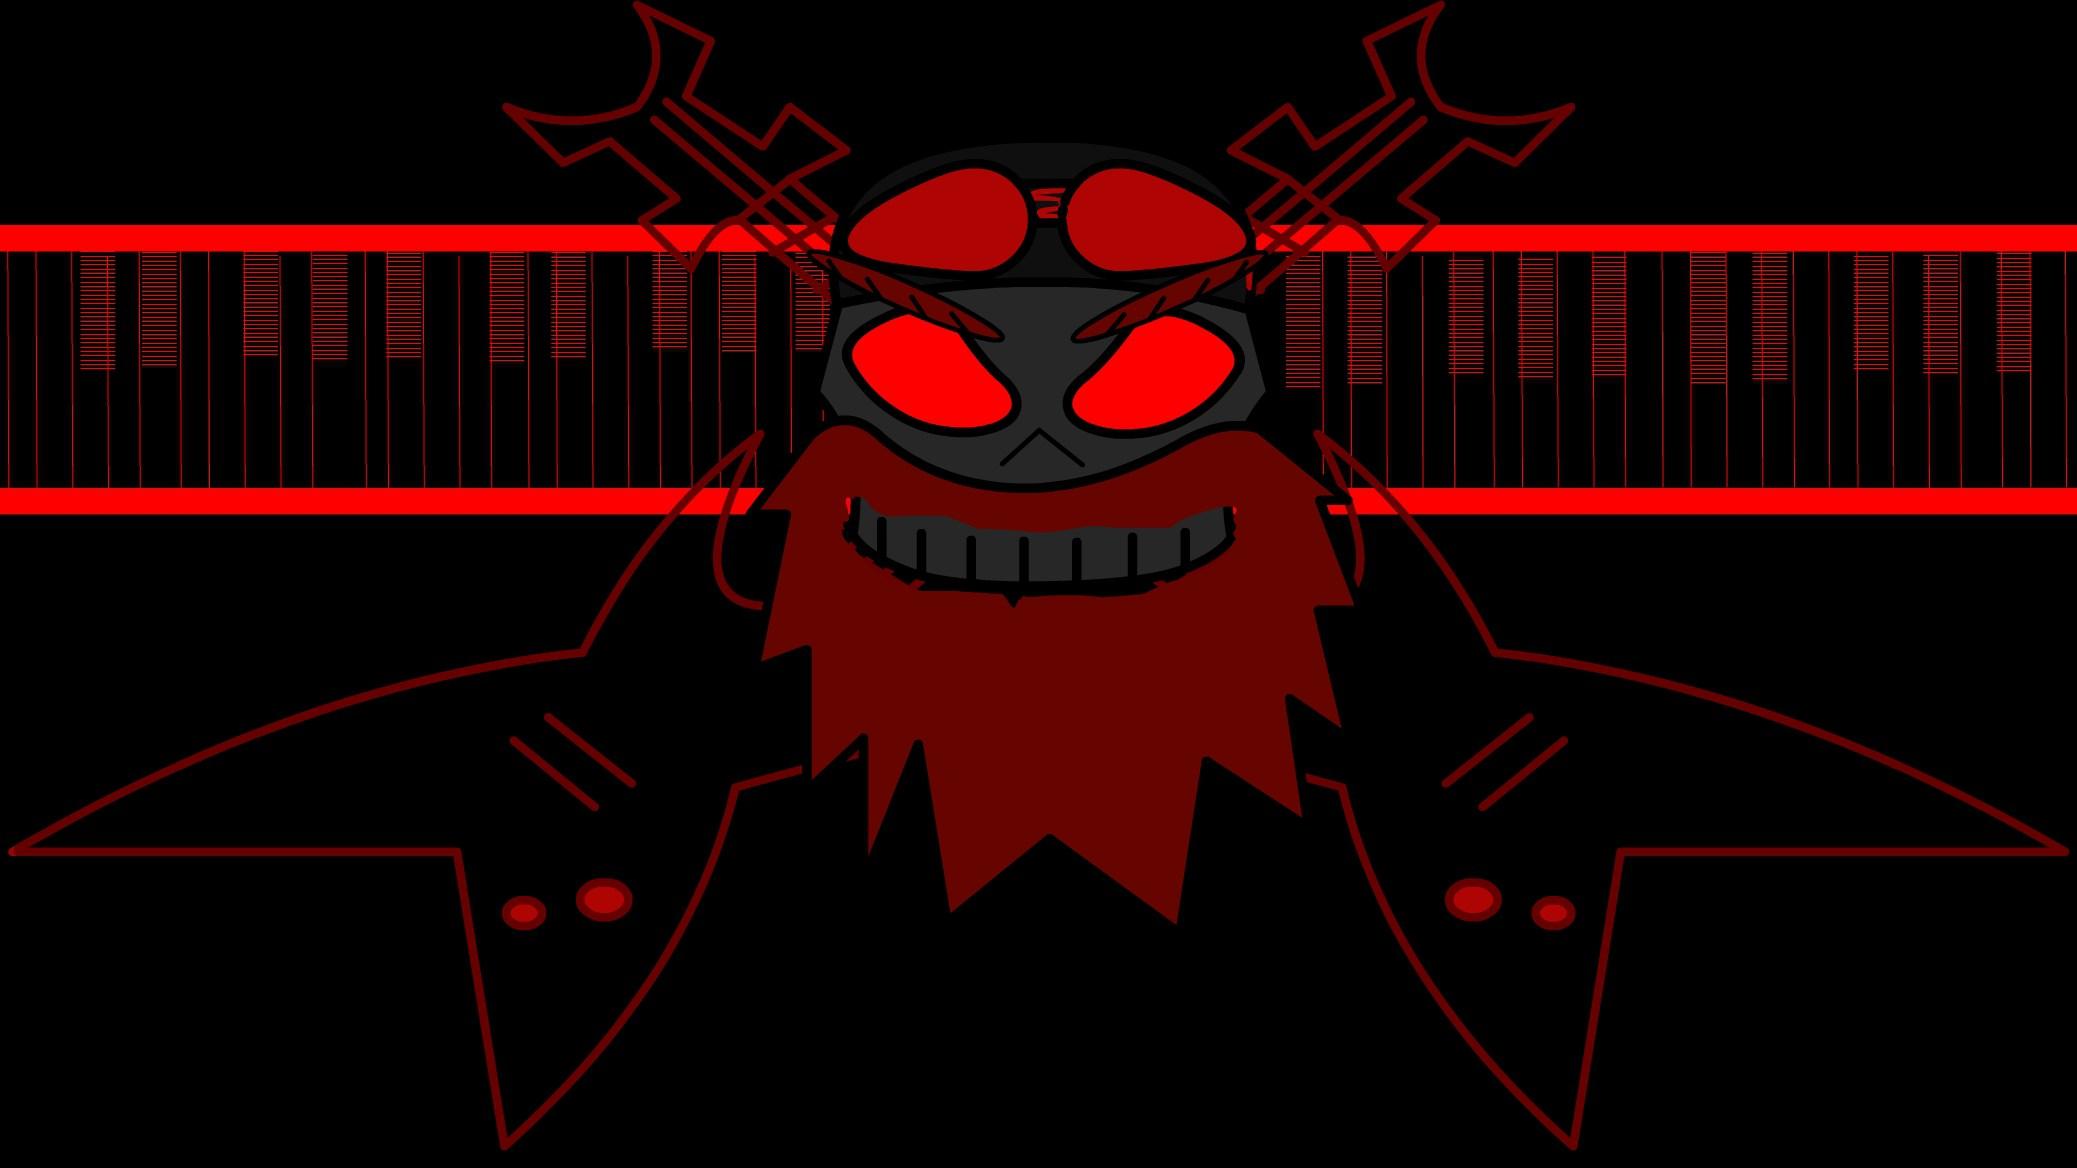 The Badman Corporation